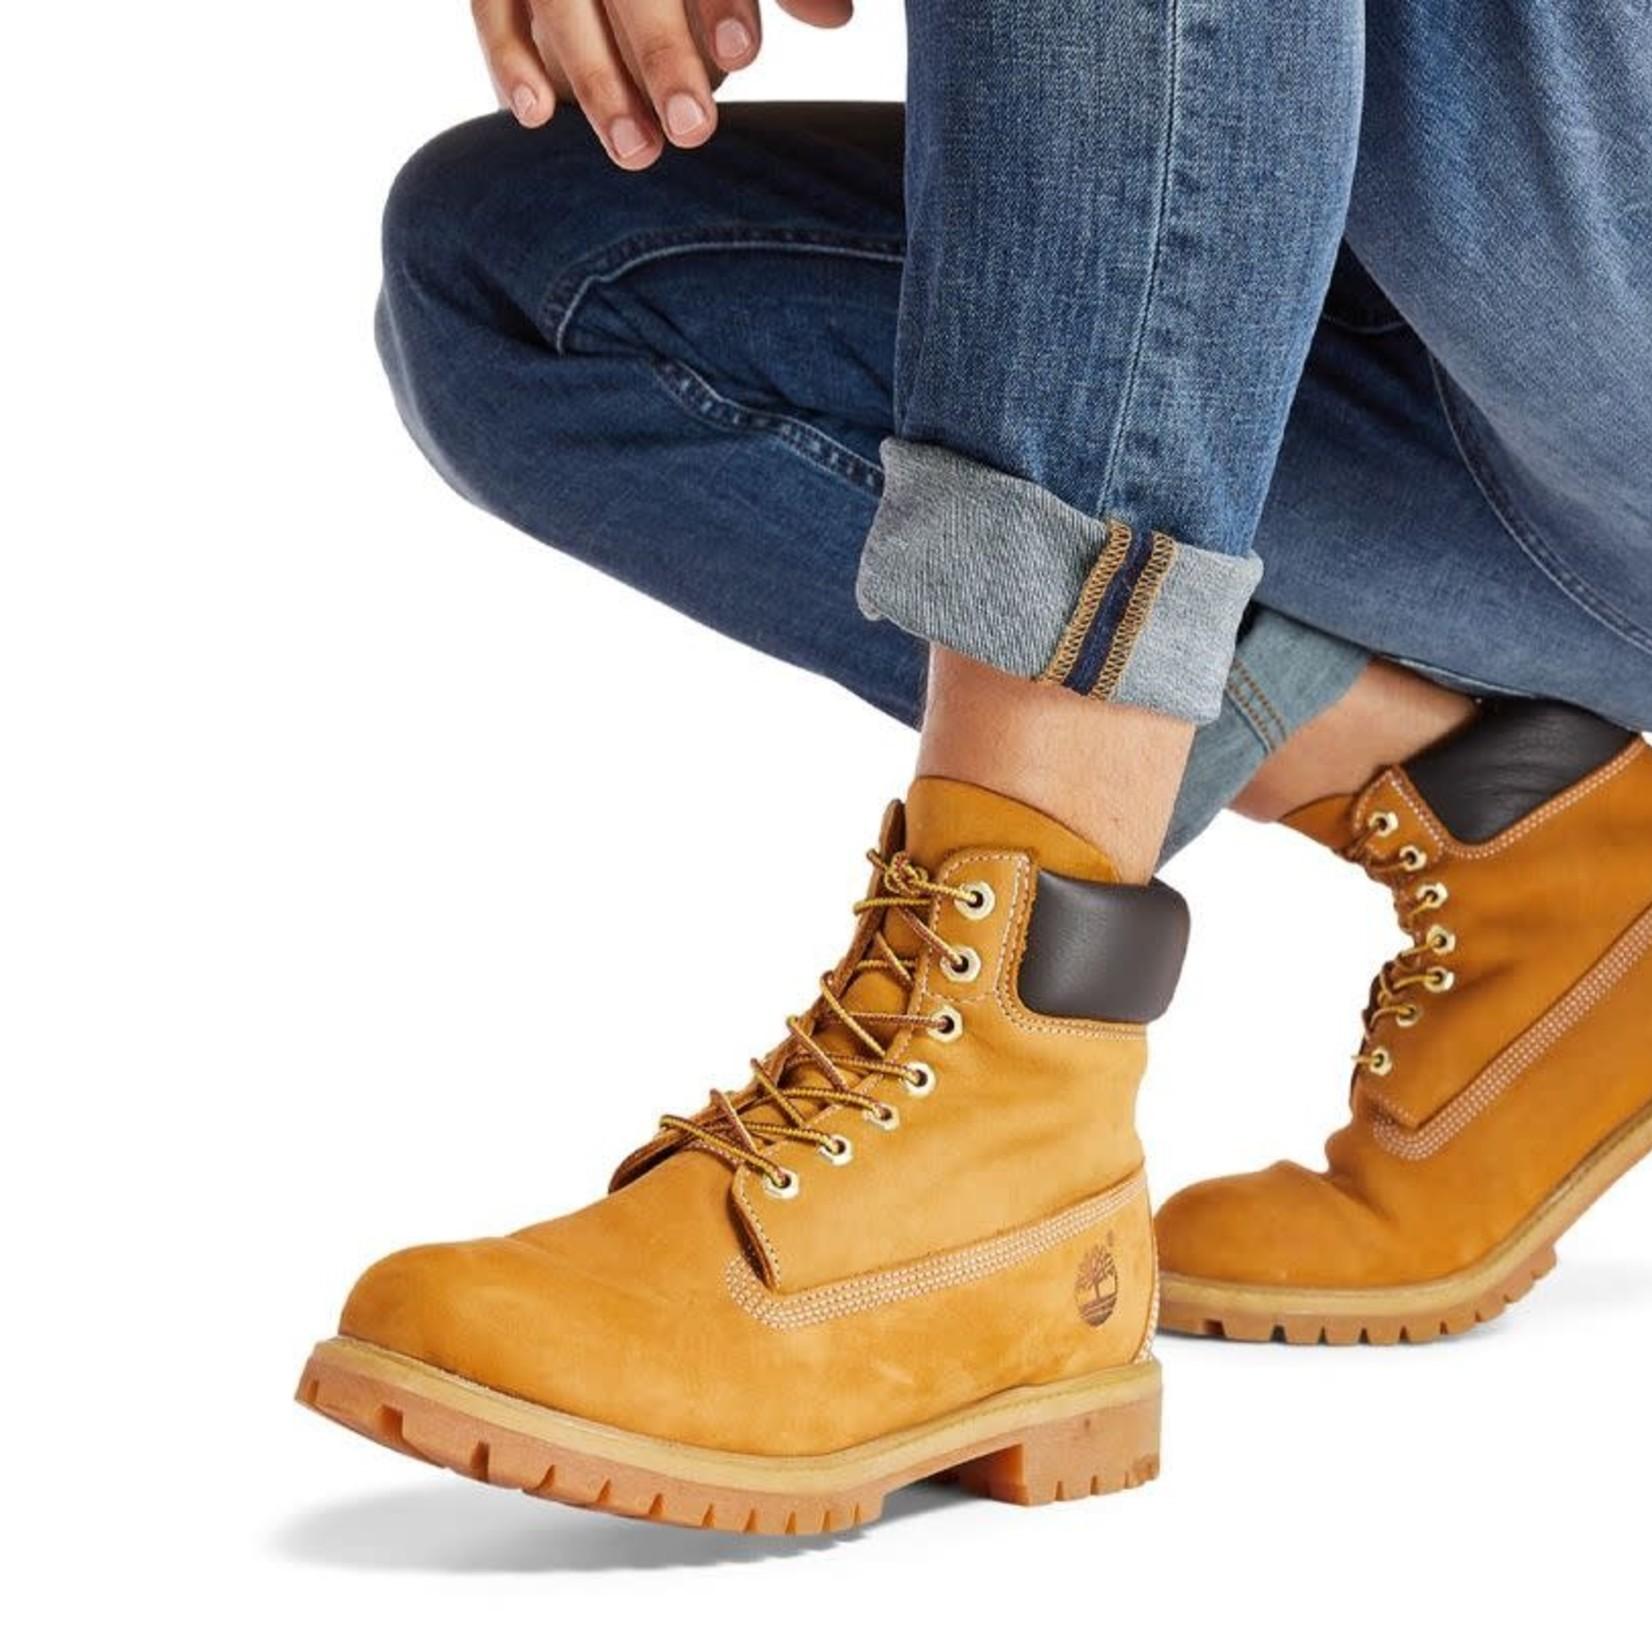 Timberland Timberland : 6in Premium Boots